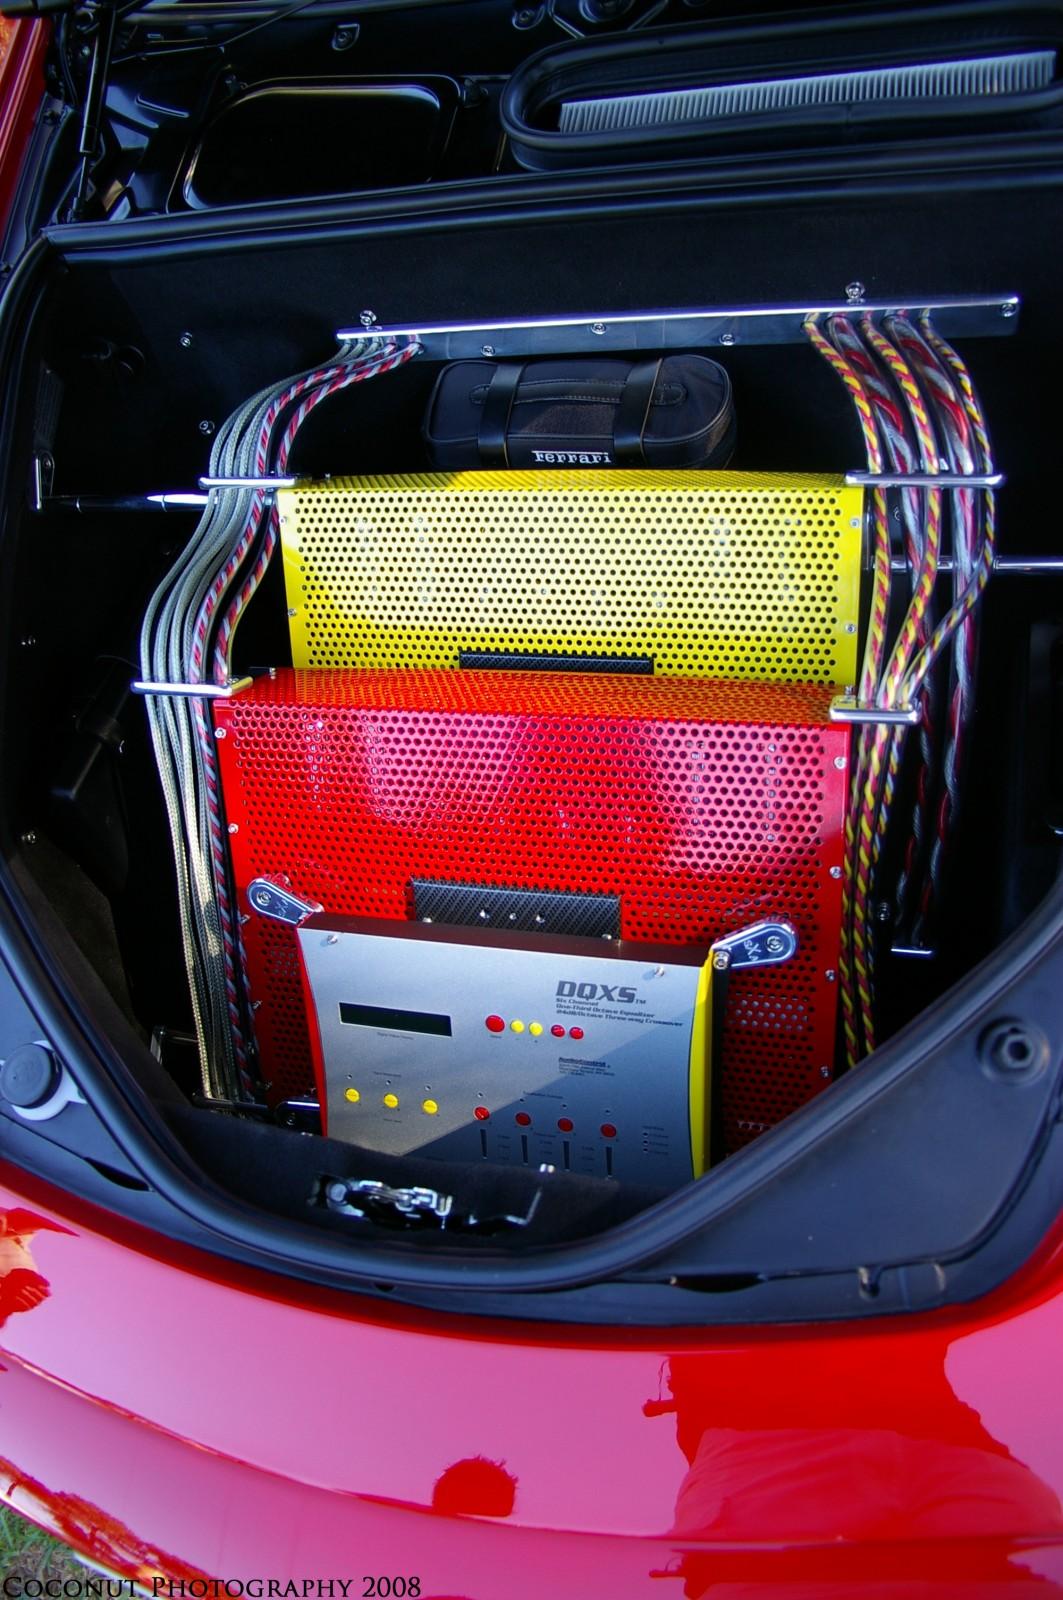 SXAUDIO Ferrari F430 - Public